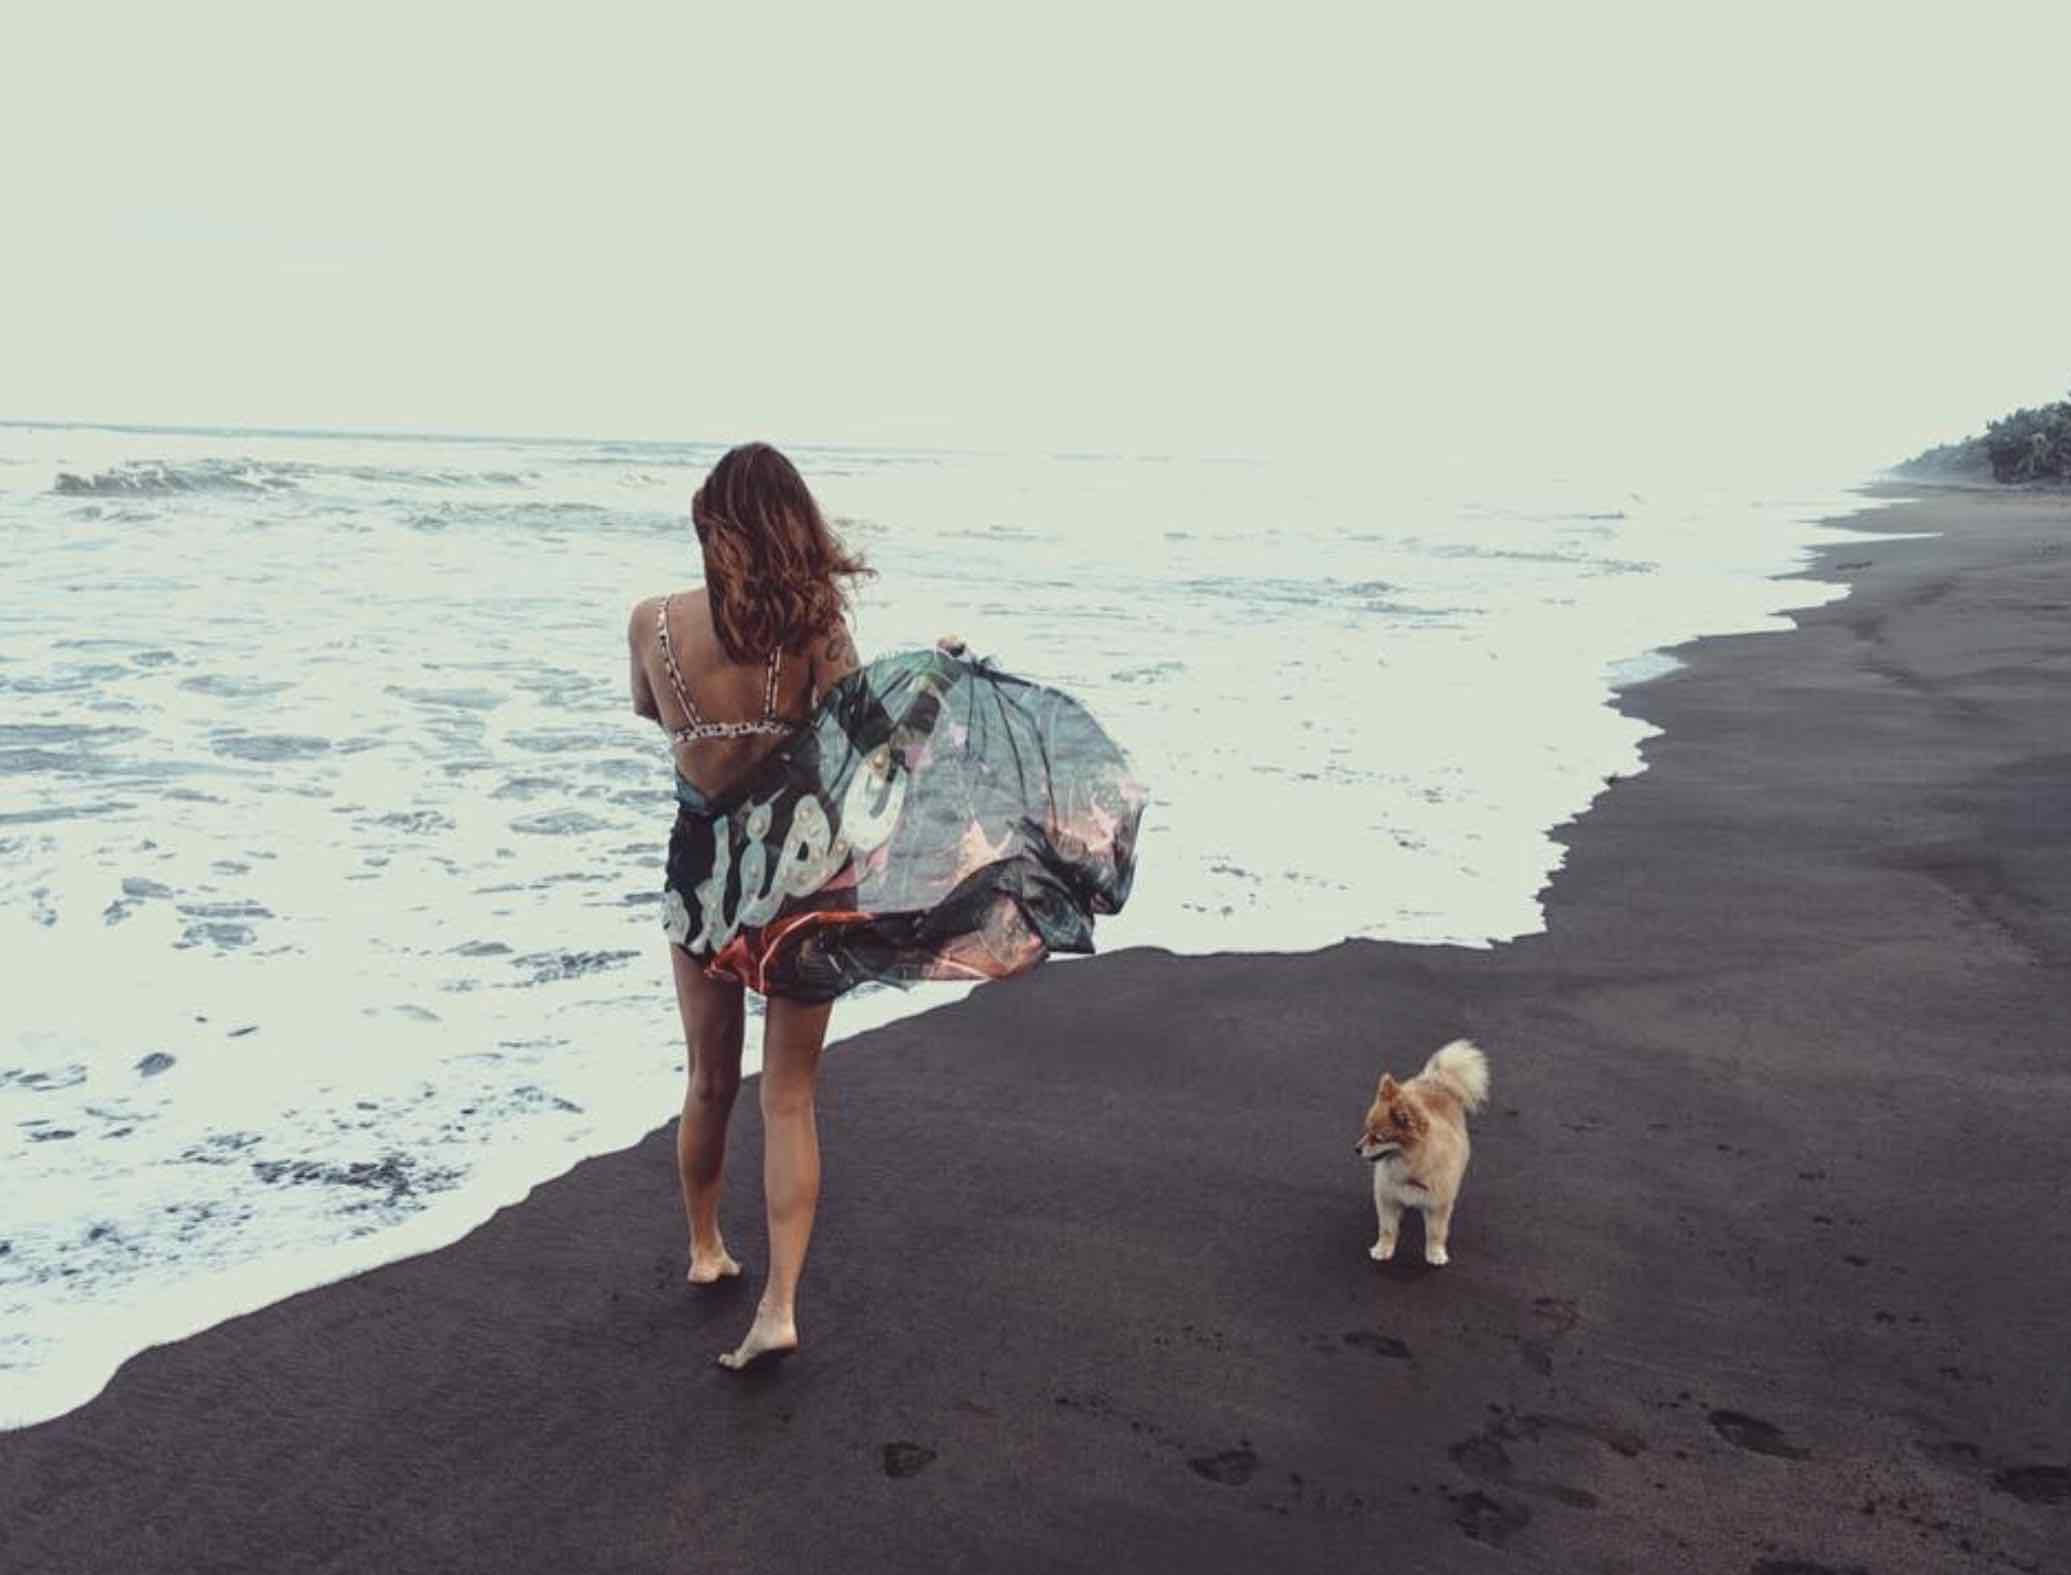 paradisxe isd where i am . scarf. beach . maialamuse.jpg